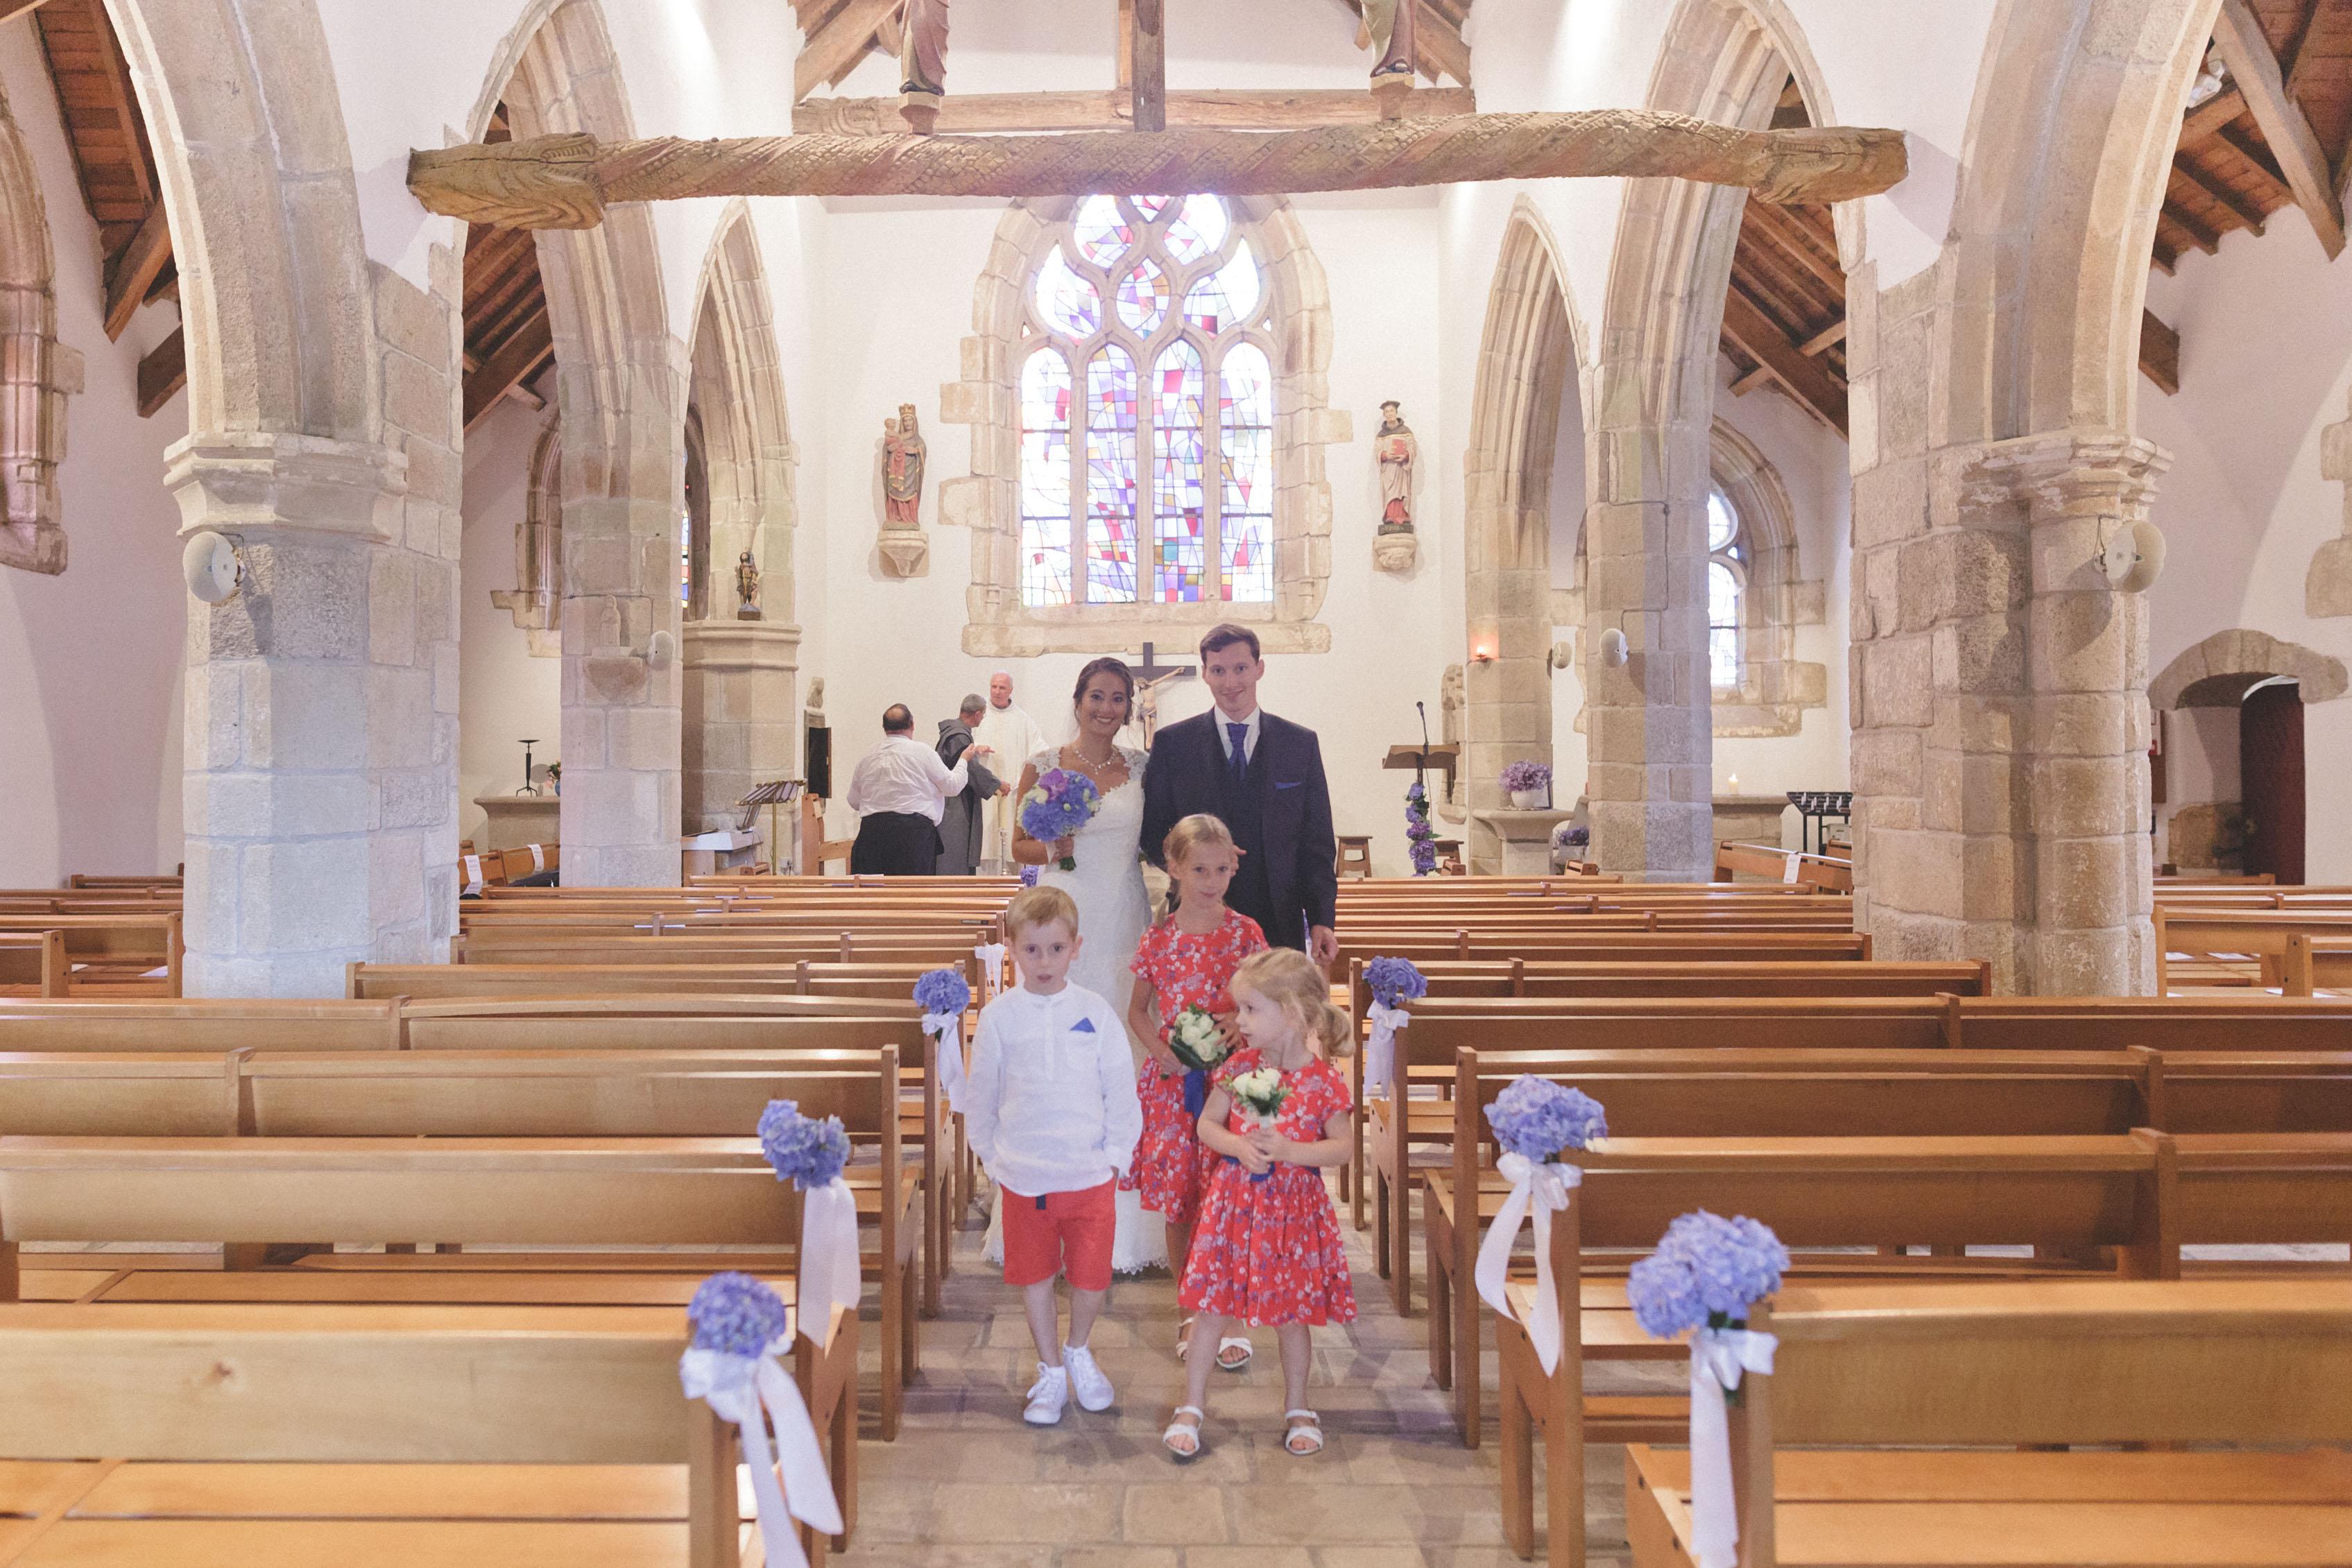 Photographie - Mariage - Bretagne - Finistere - Morbihan - Lilian Vezin Photographie (22)